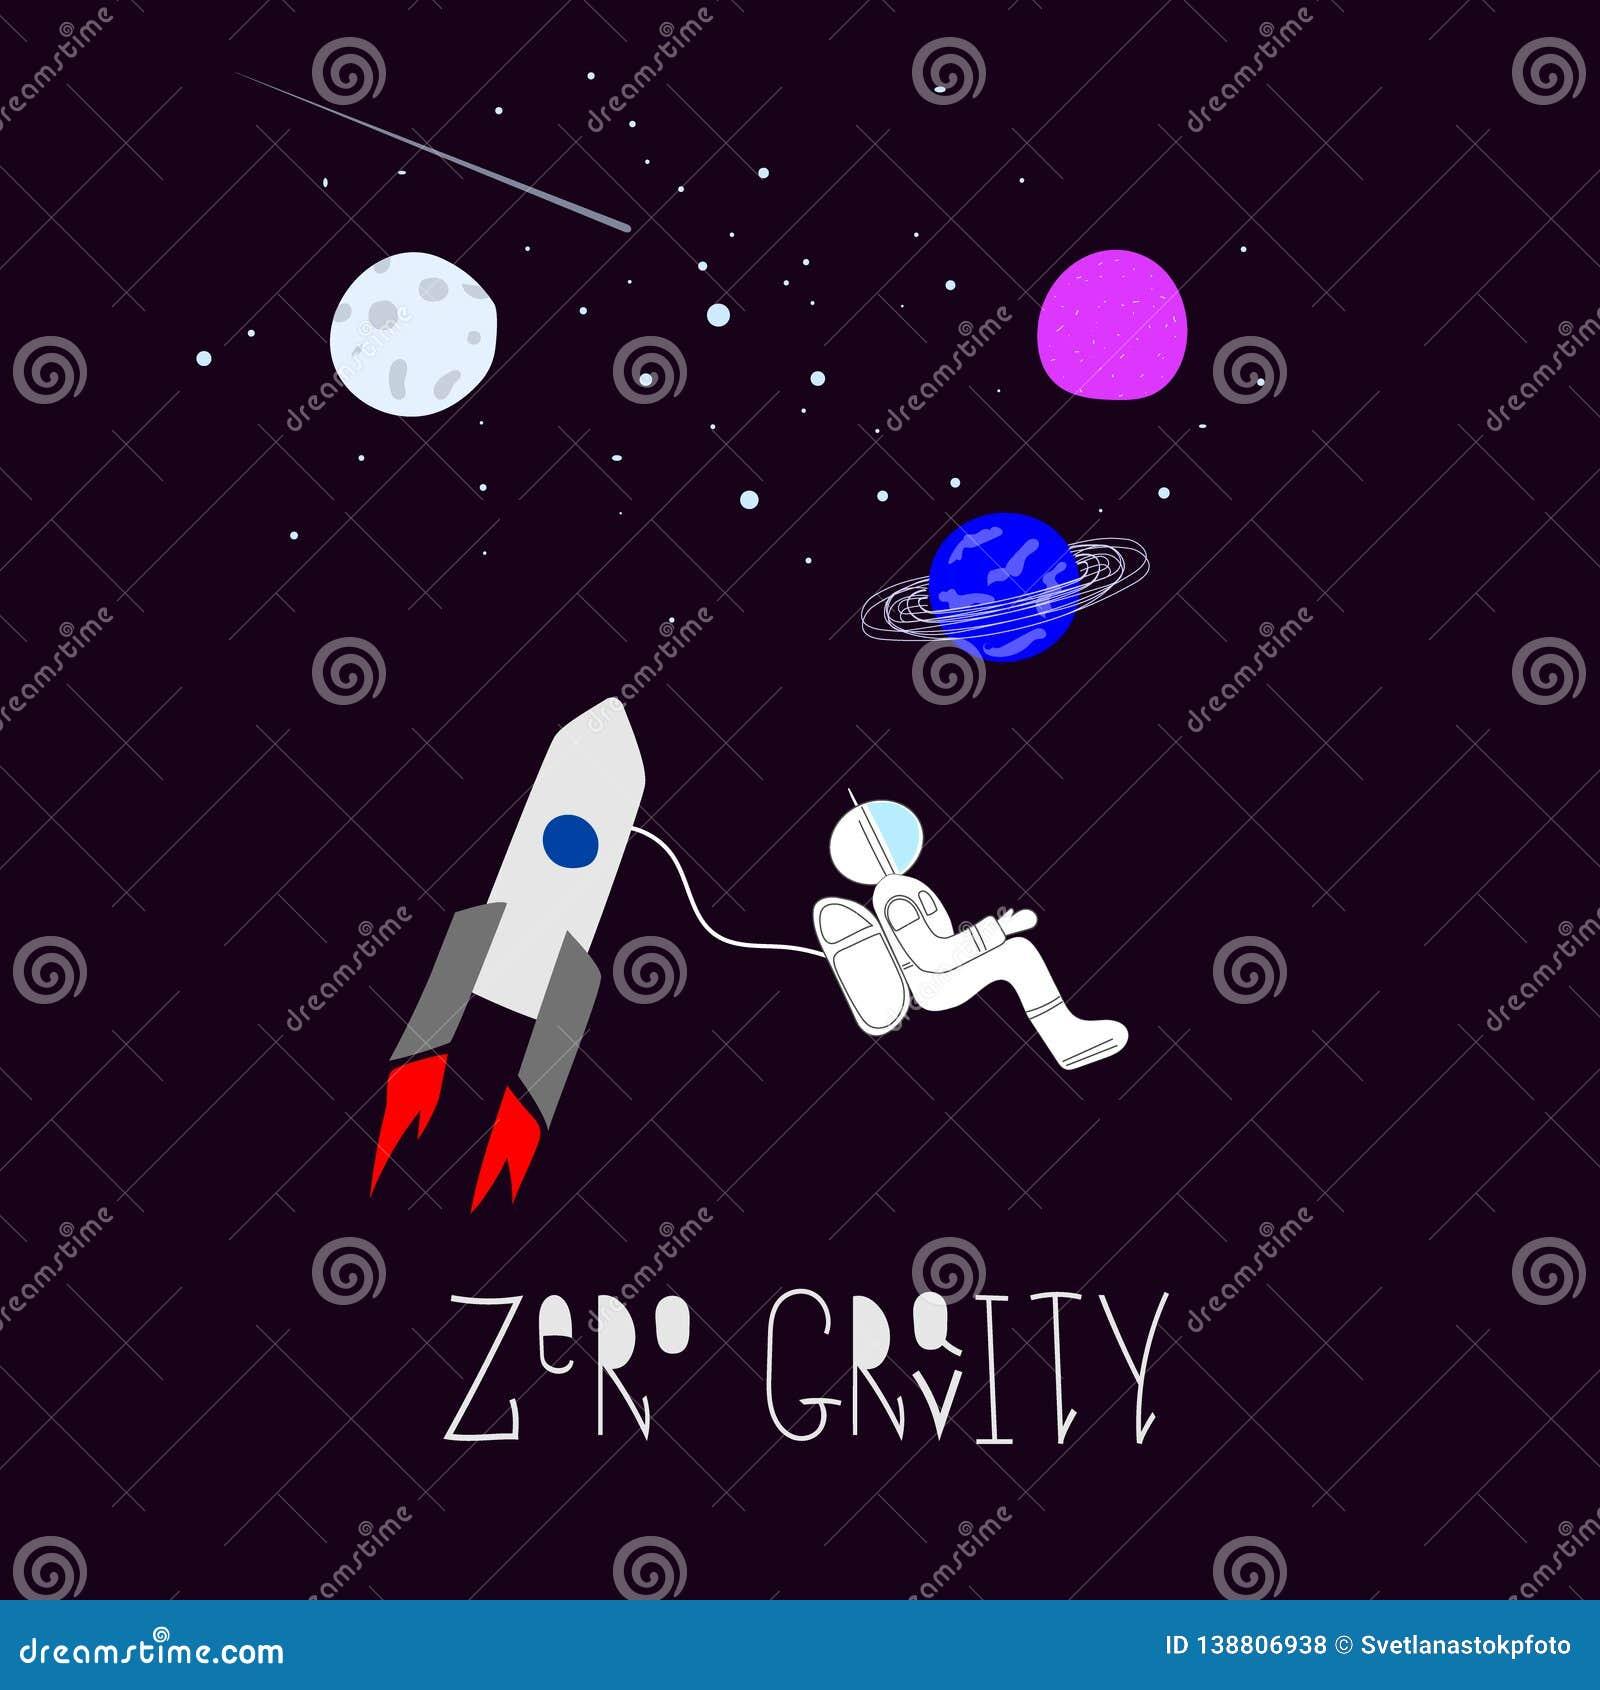 Zero Gravity Universe Space Astronaut Nature Star Cutout Scircle